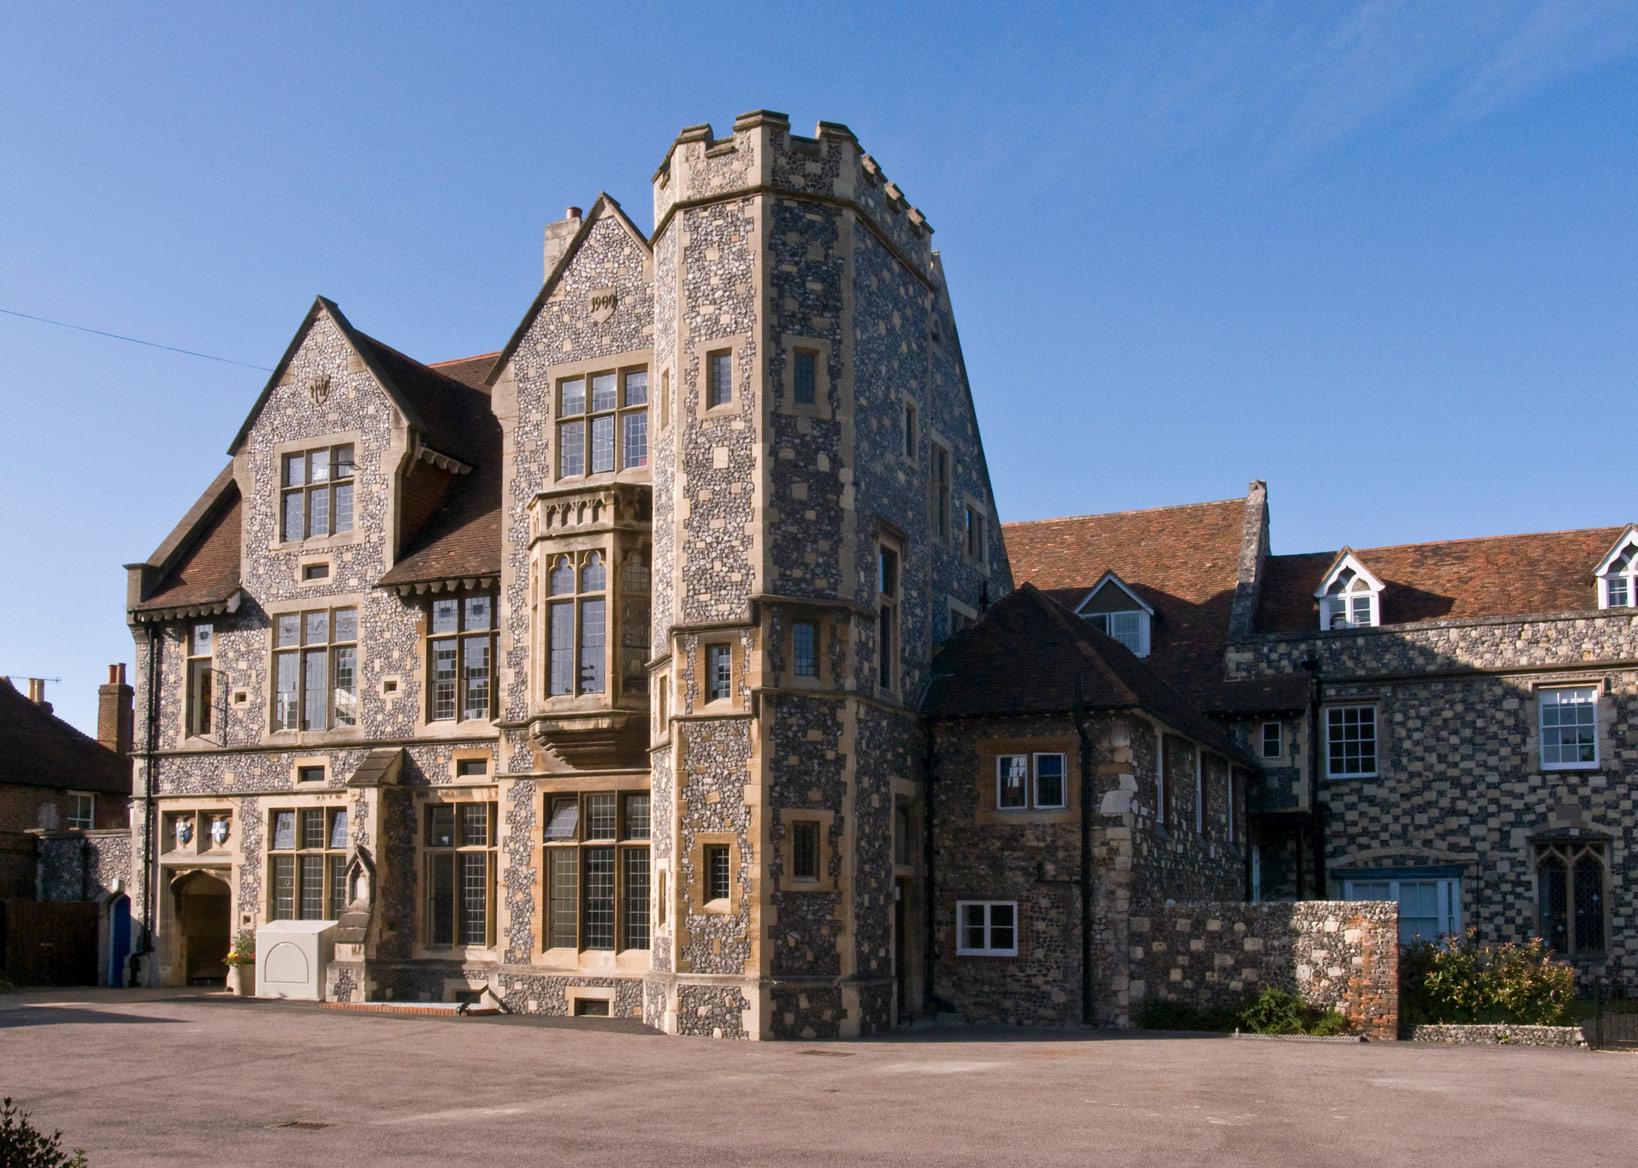 The-Kings-School-Canterbury-ingiltere-lise-egitimi-okulu-4.jpg